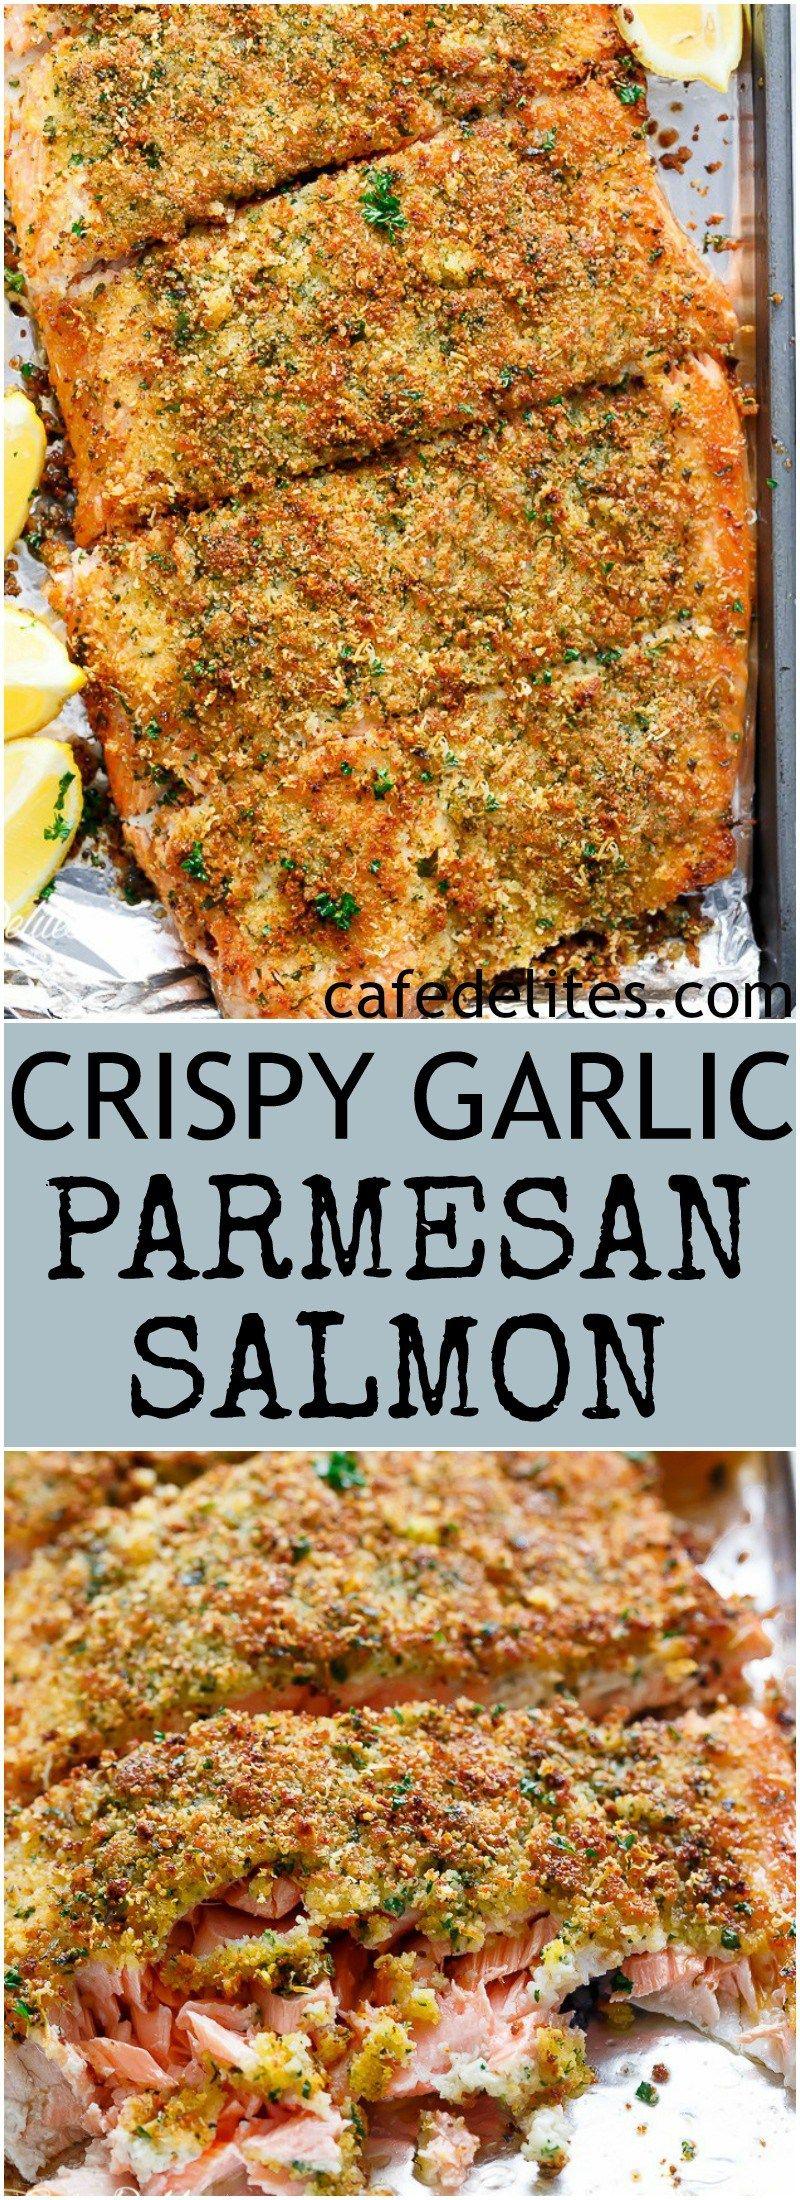 #salmonrecipes